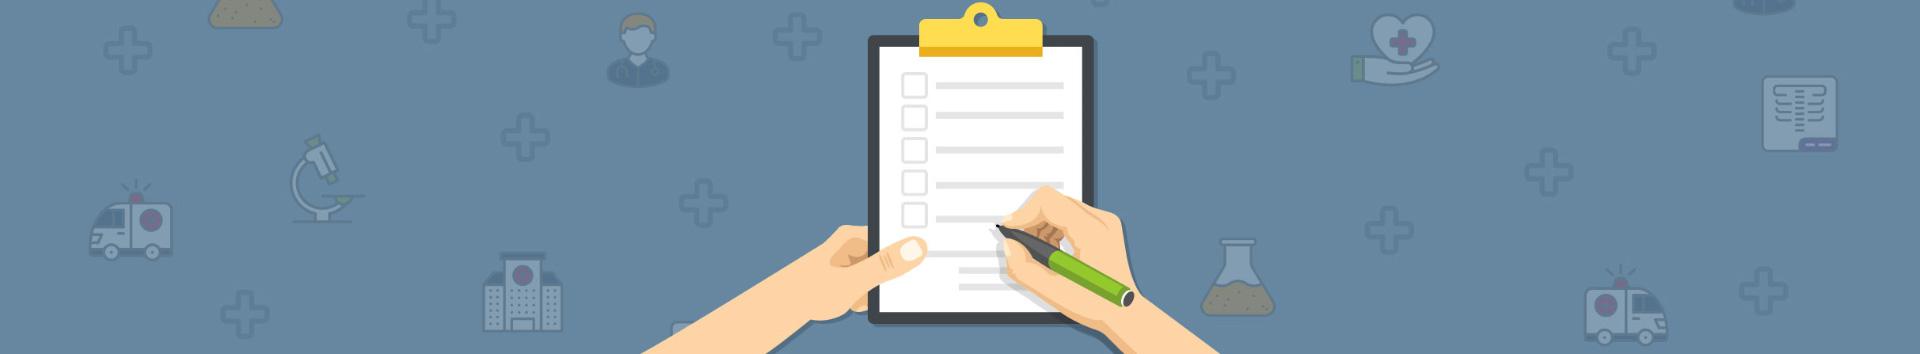 Pillar Page Checklist hero